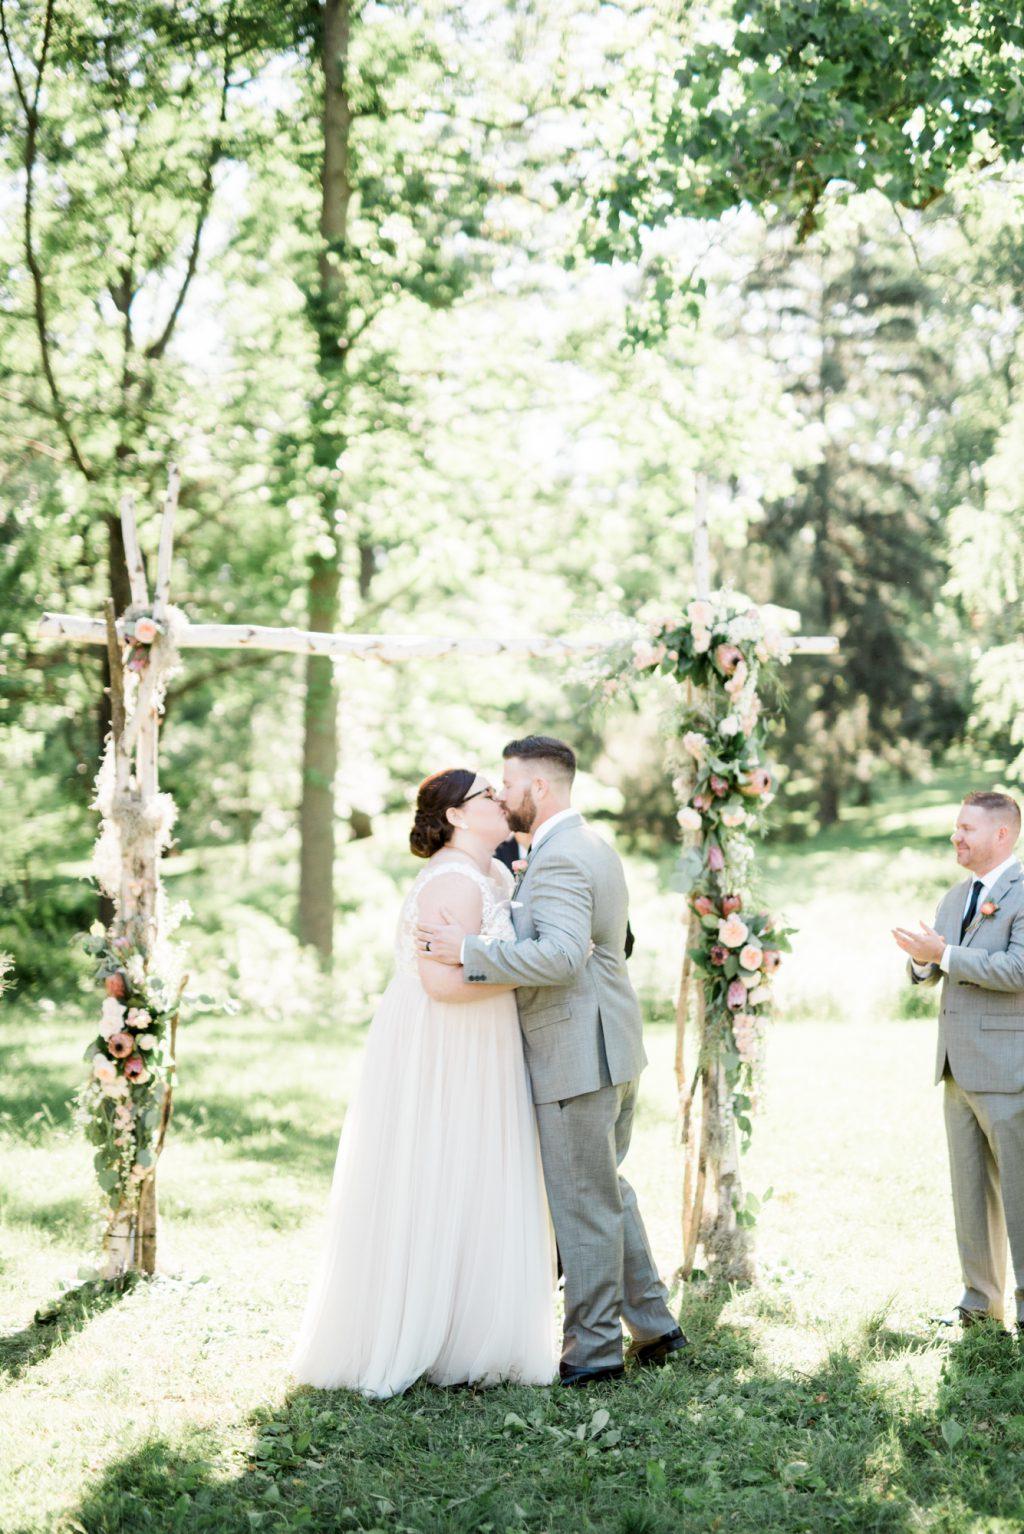 haley-richter-photo-west-chester-summer-wedding-boxcar-brewery-125